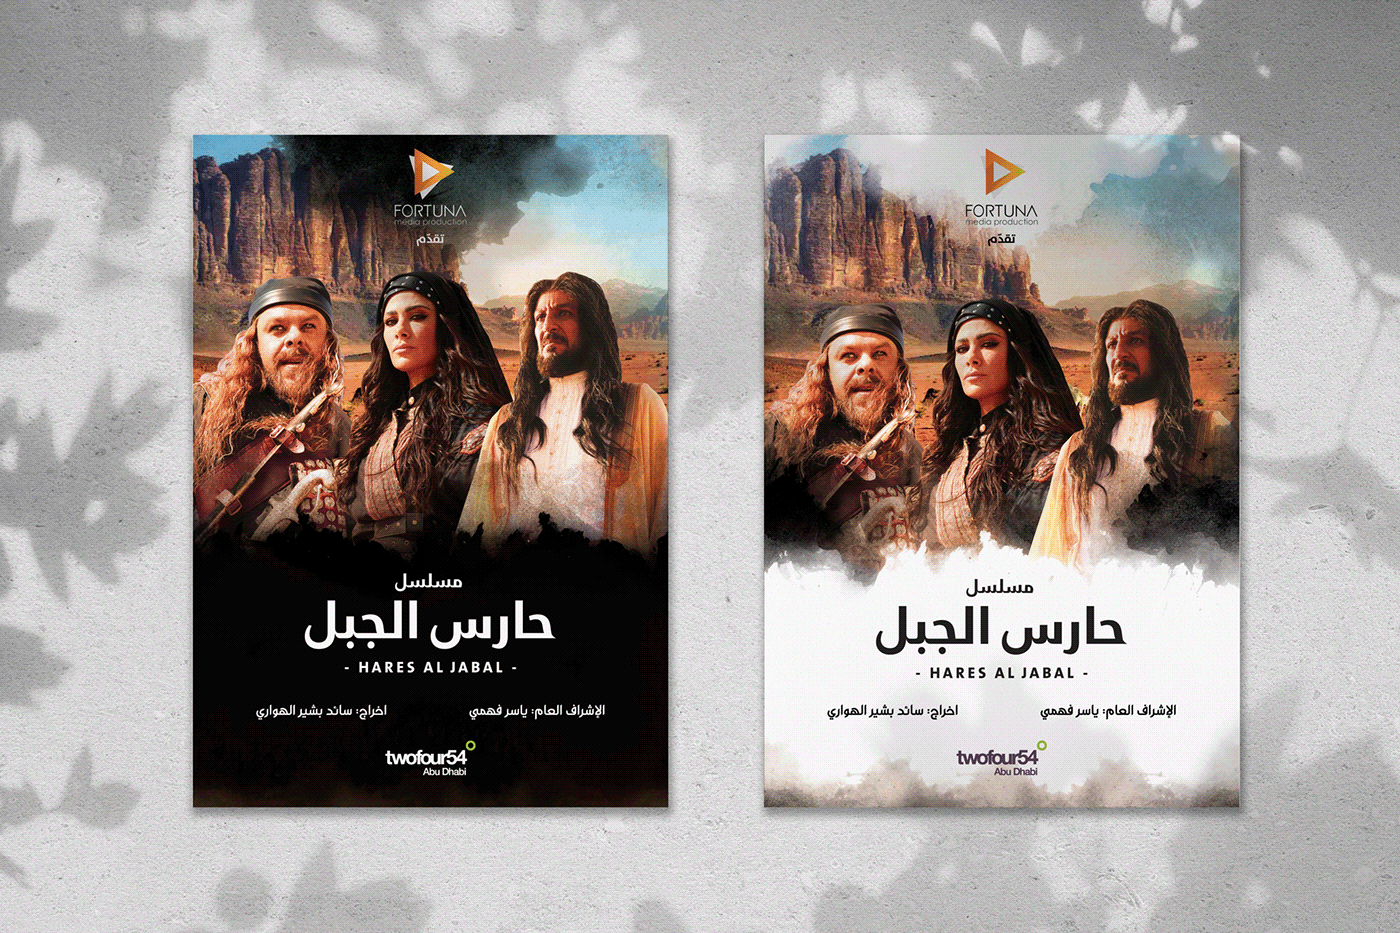 Abu Dhabi bedouin Fortuna Hares Al Jabal posters promo tv show twofour54 UAE